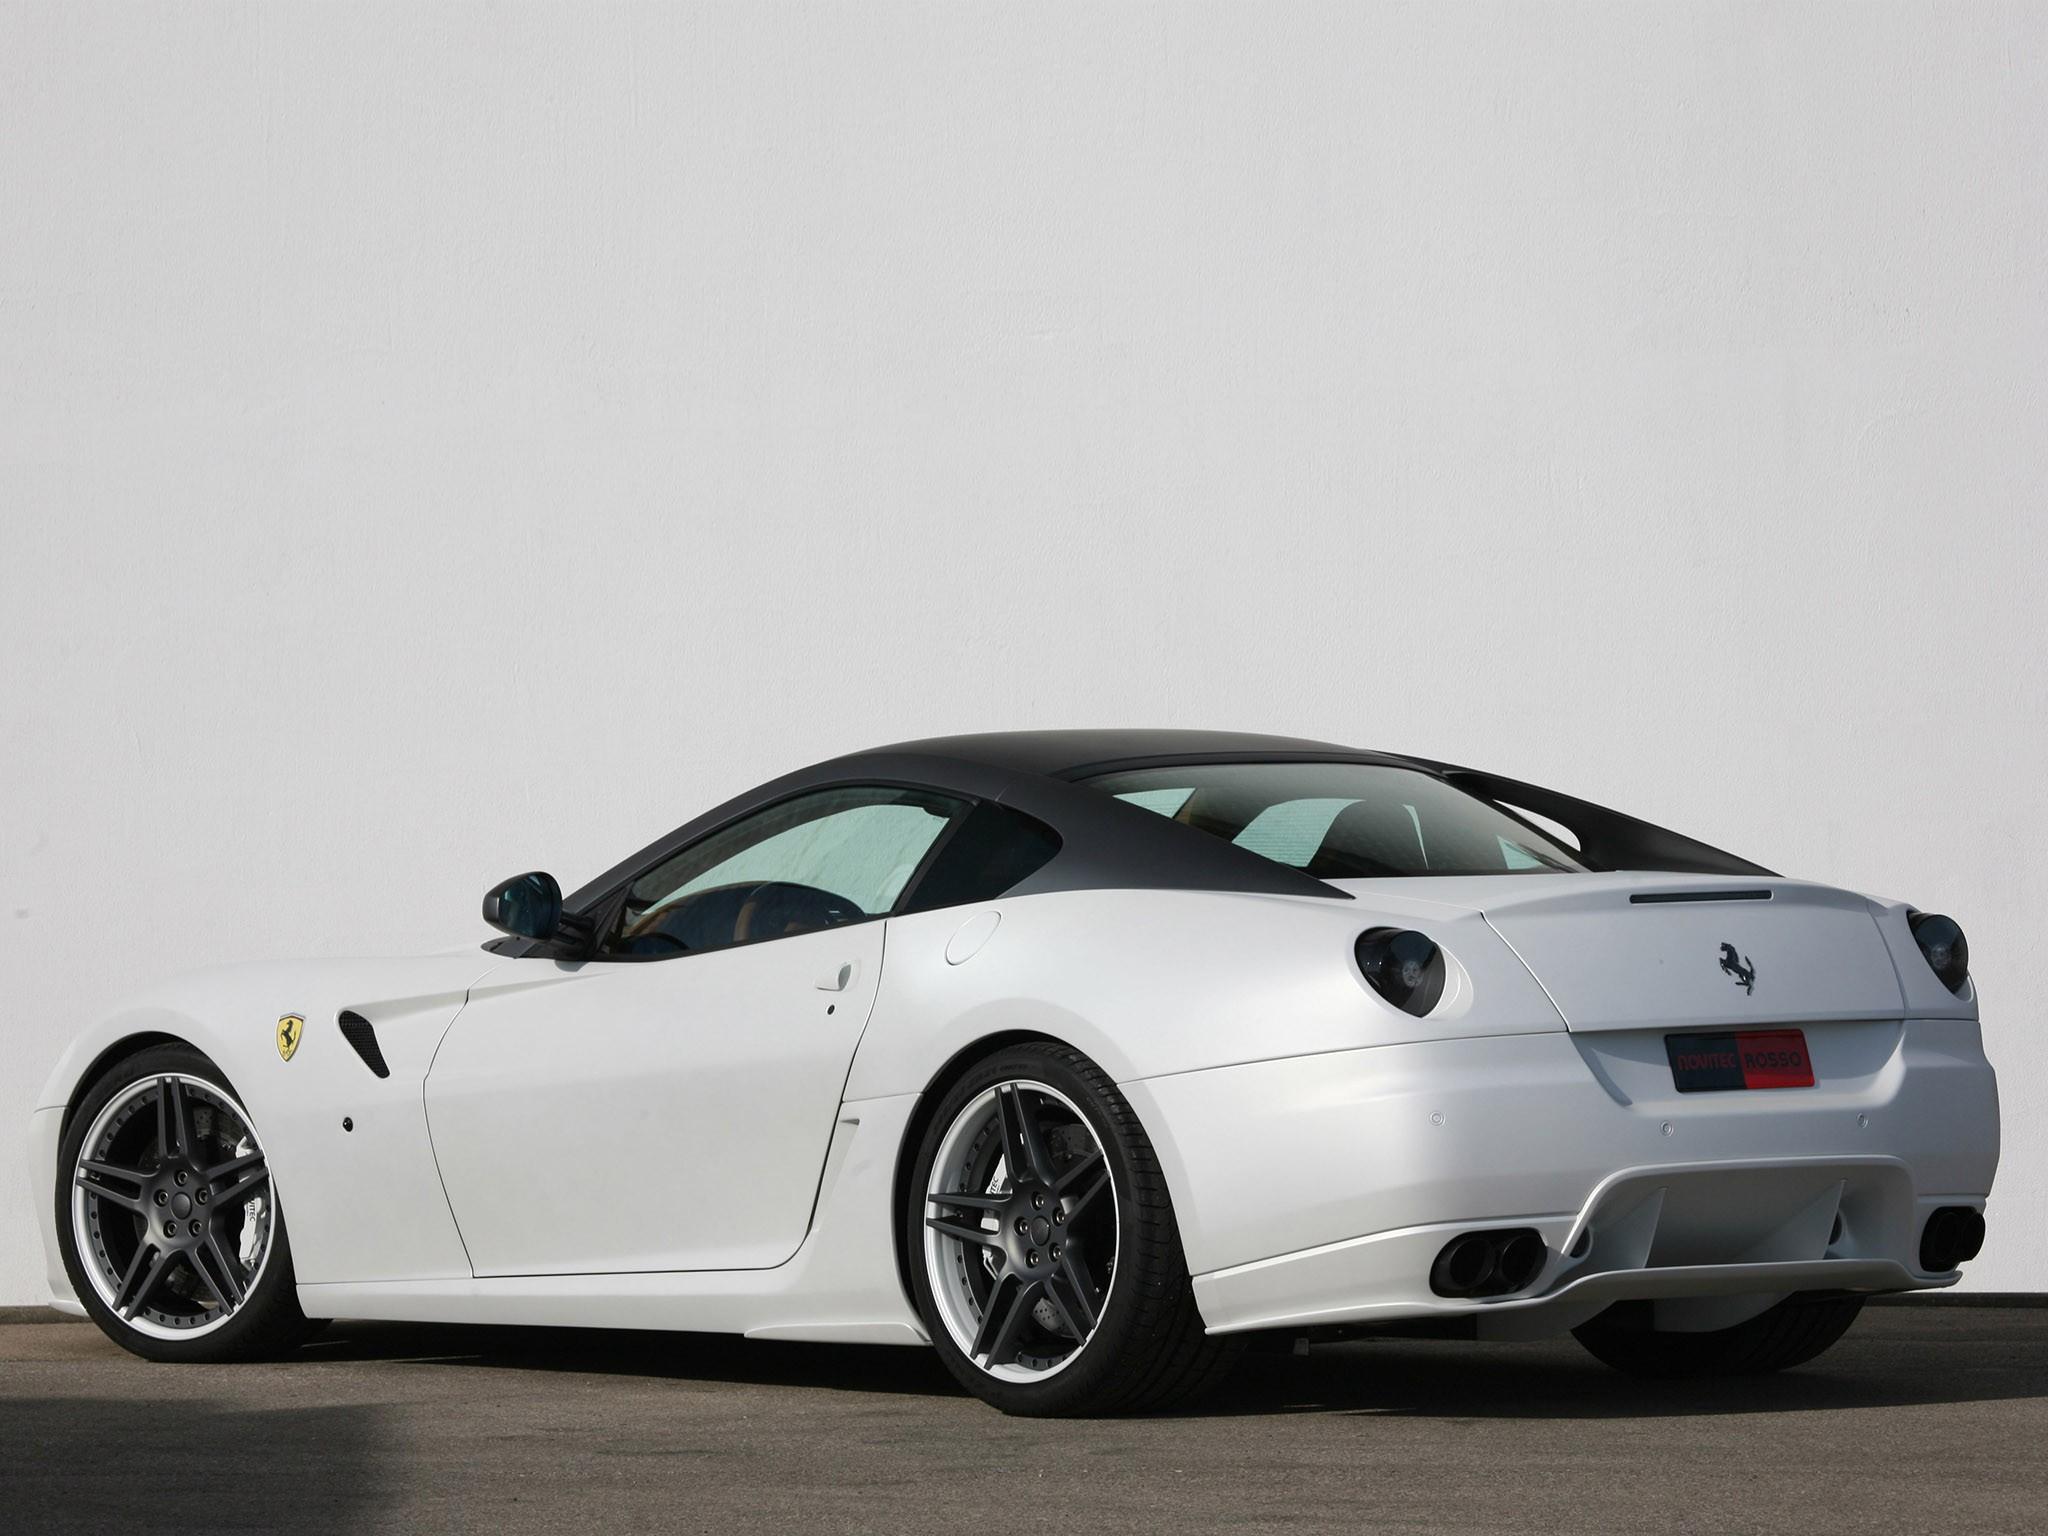 2010 Novitec Ferrari 599 GTB Race 848